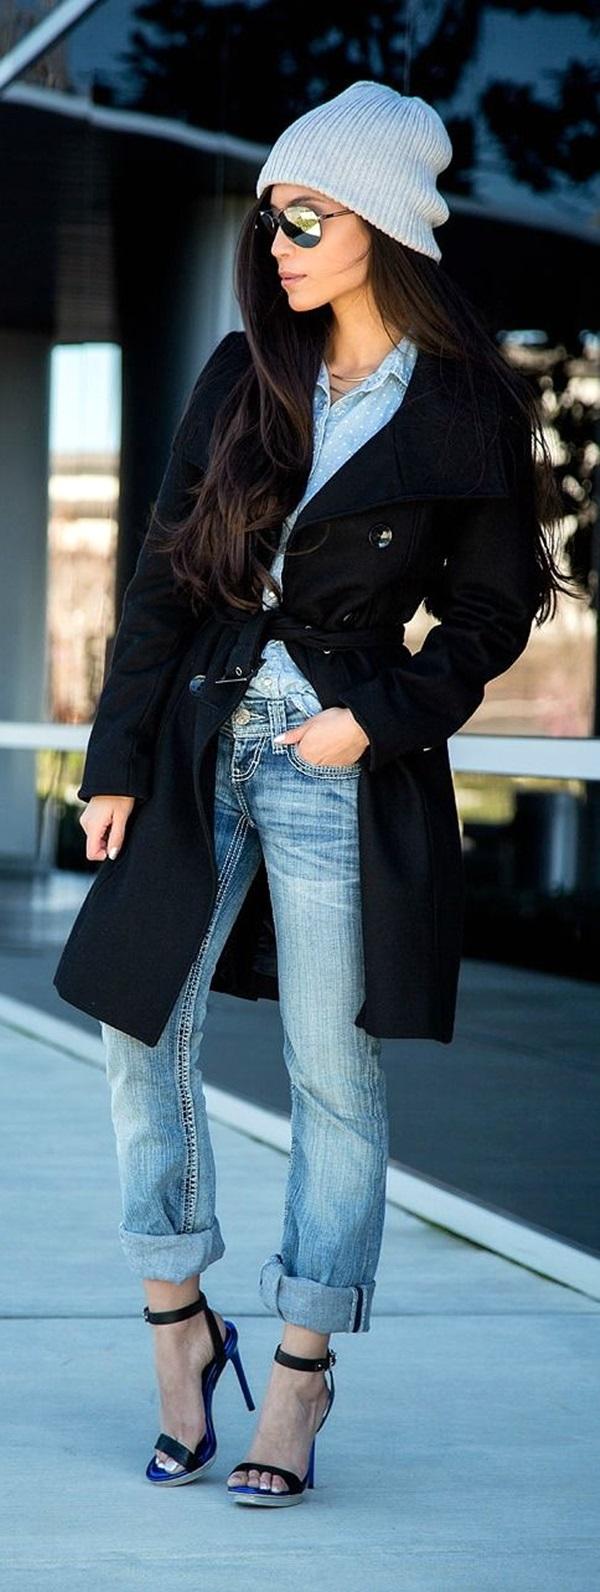 Winter Street Style Fashion 2015 (25)